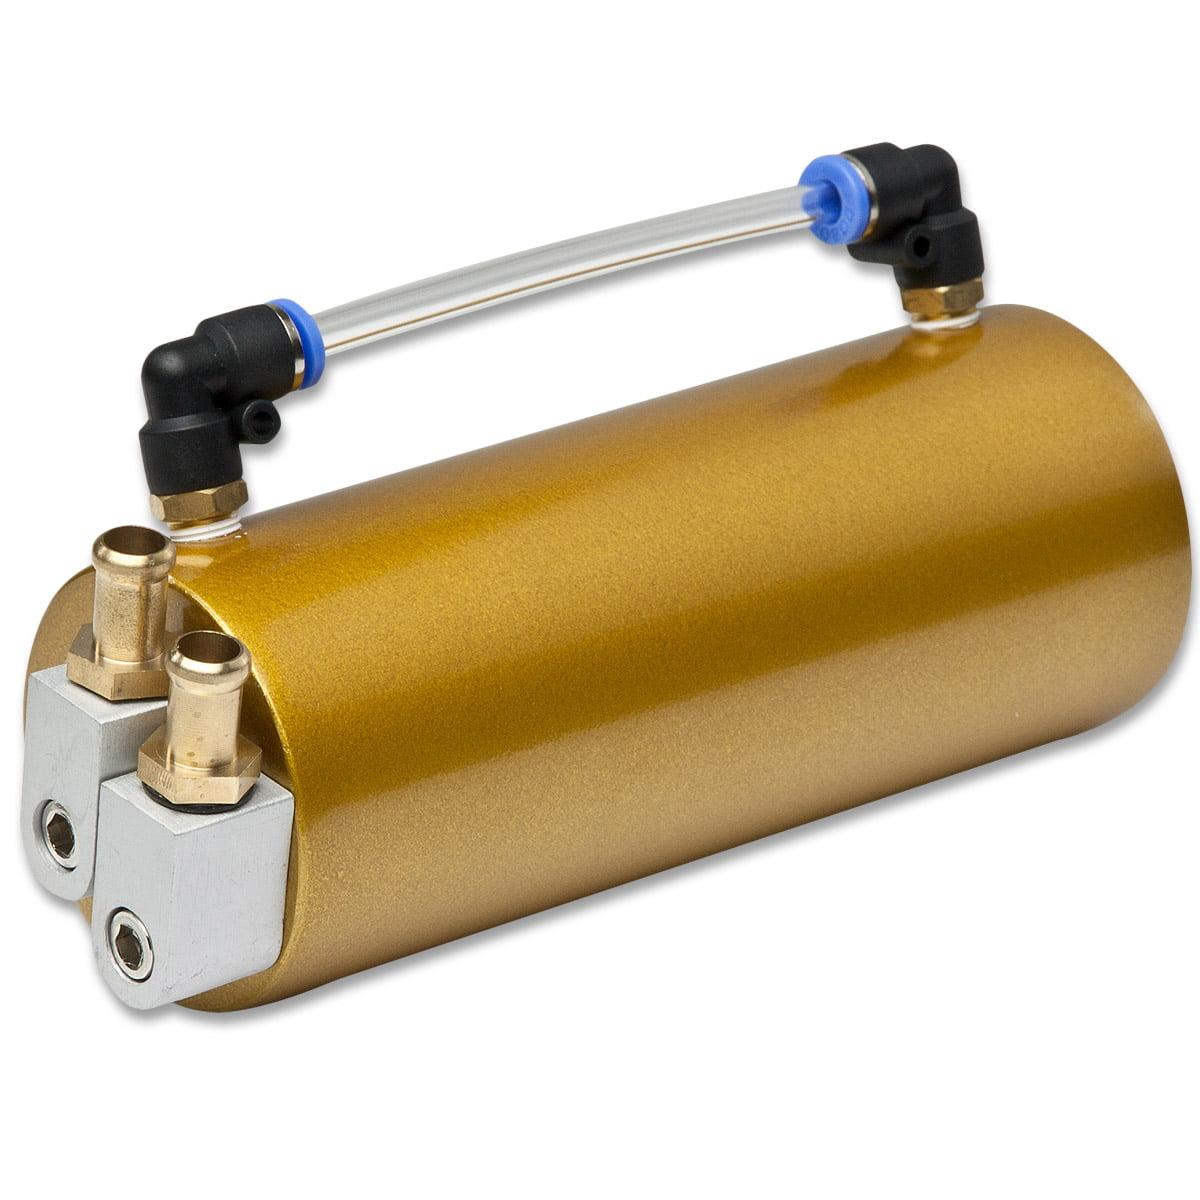 Univeral Aluminum Racing Oil Catch Tank - Gold Tank